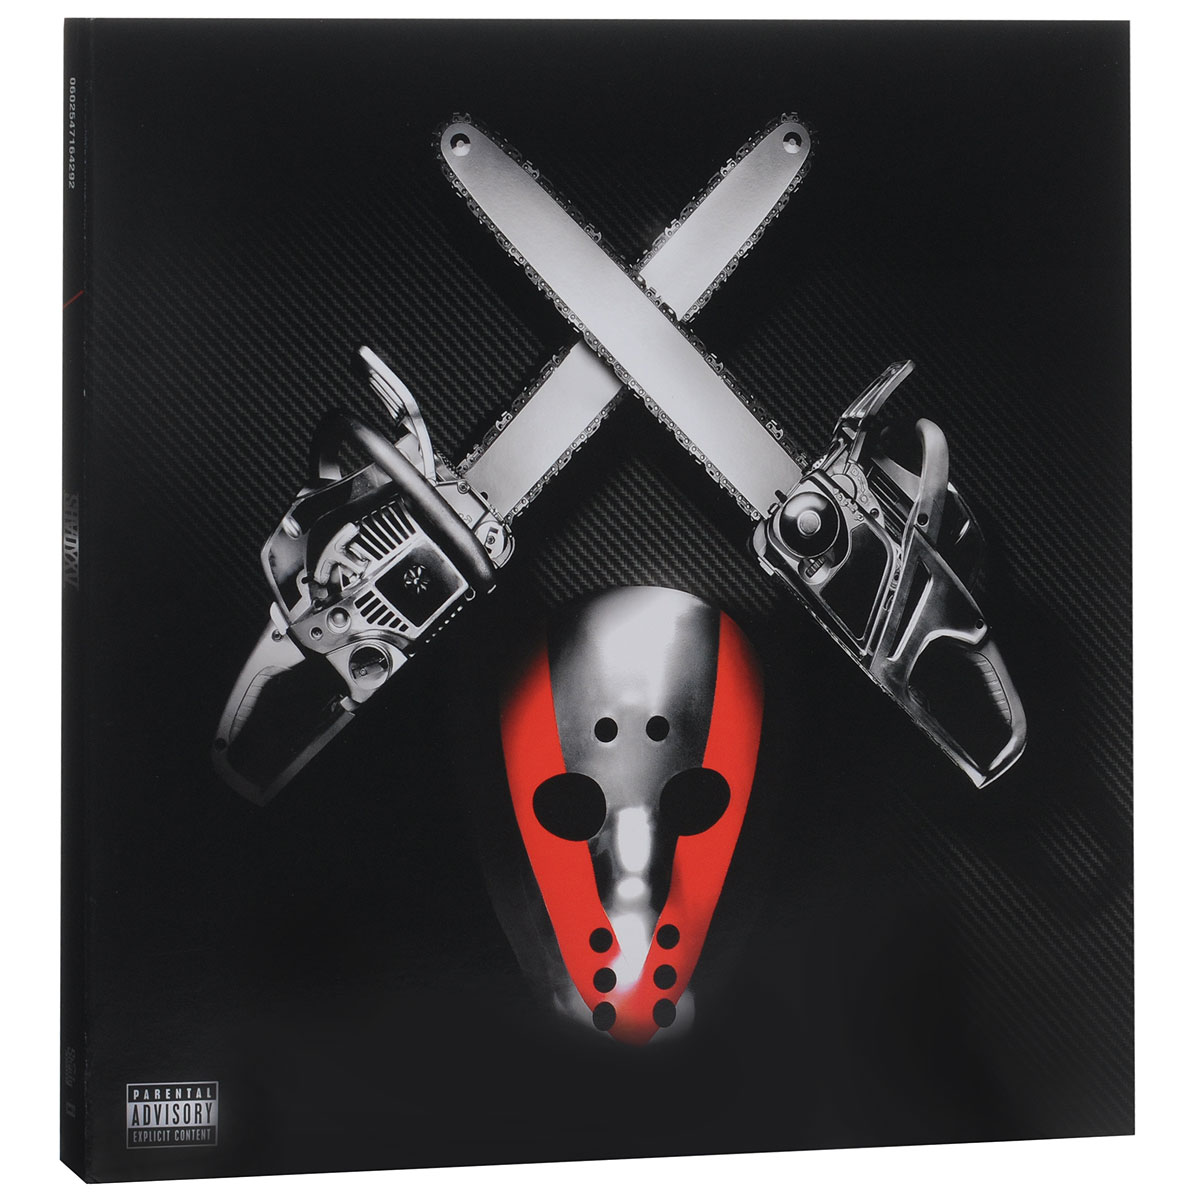 Эминем,Slaughterhouse,Kobe,Bad Meets Evil,Sia,Yelawolf,D-12,Skylar Grey,50 Cent,Obie Trice Eminem. ShadyXV (4 LP) eminem eminem relapse 2 lp